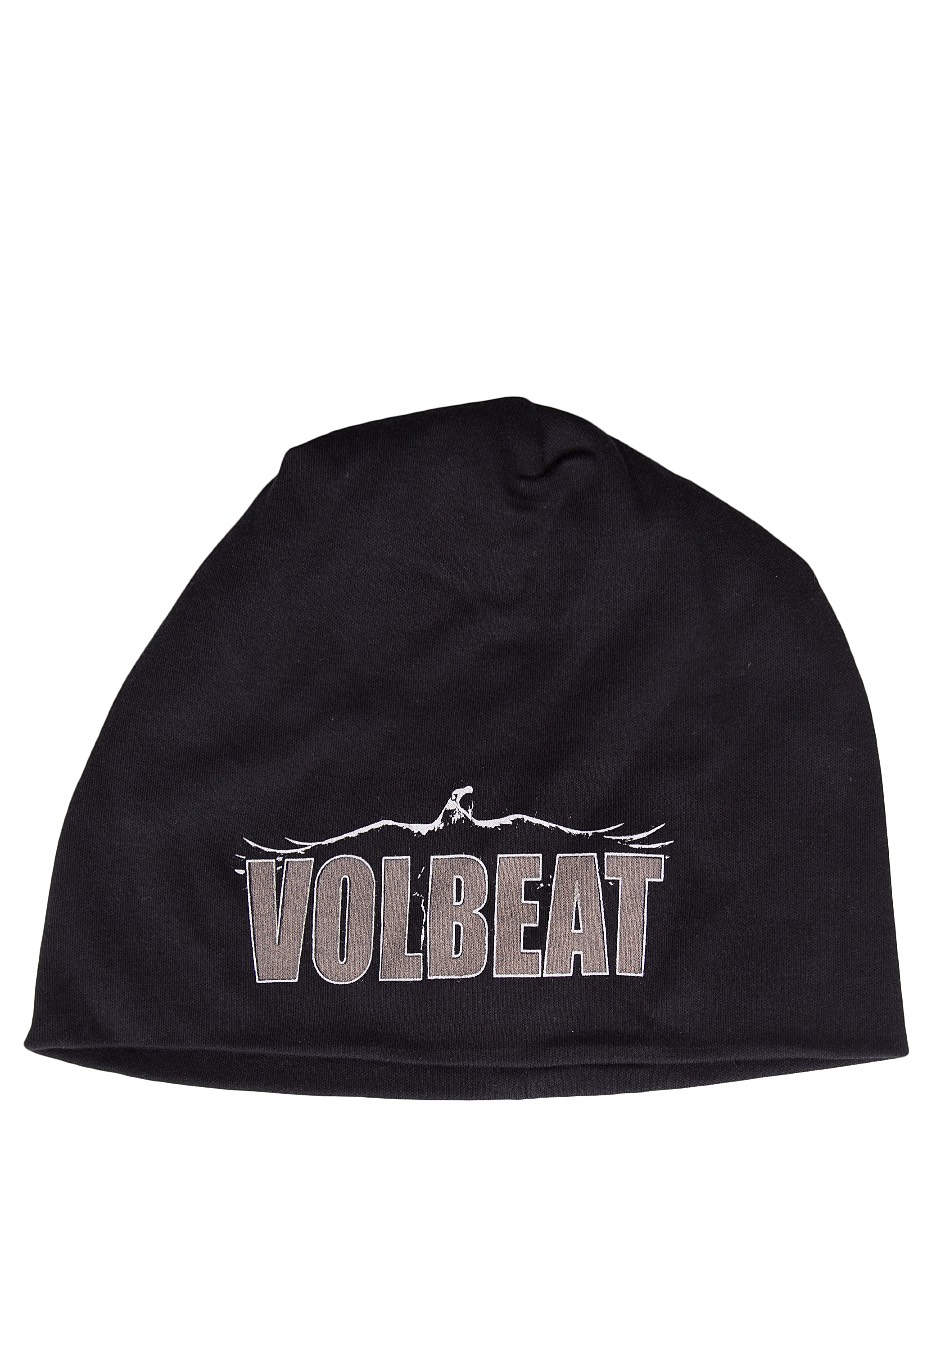 Volbeat - Logo - Beanies